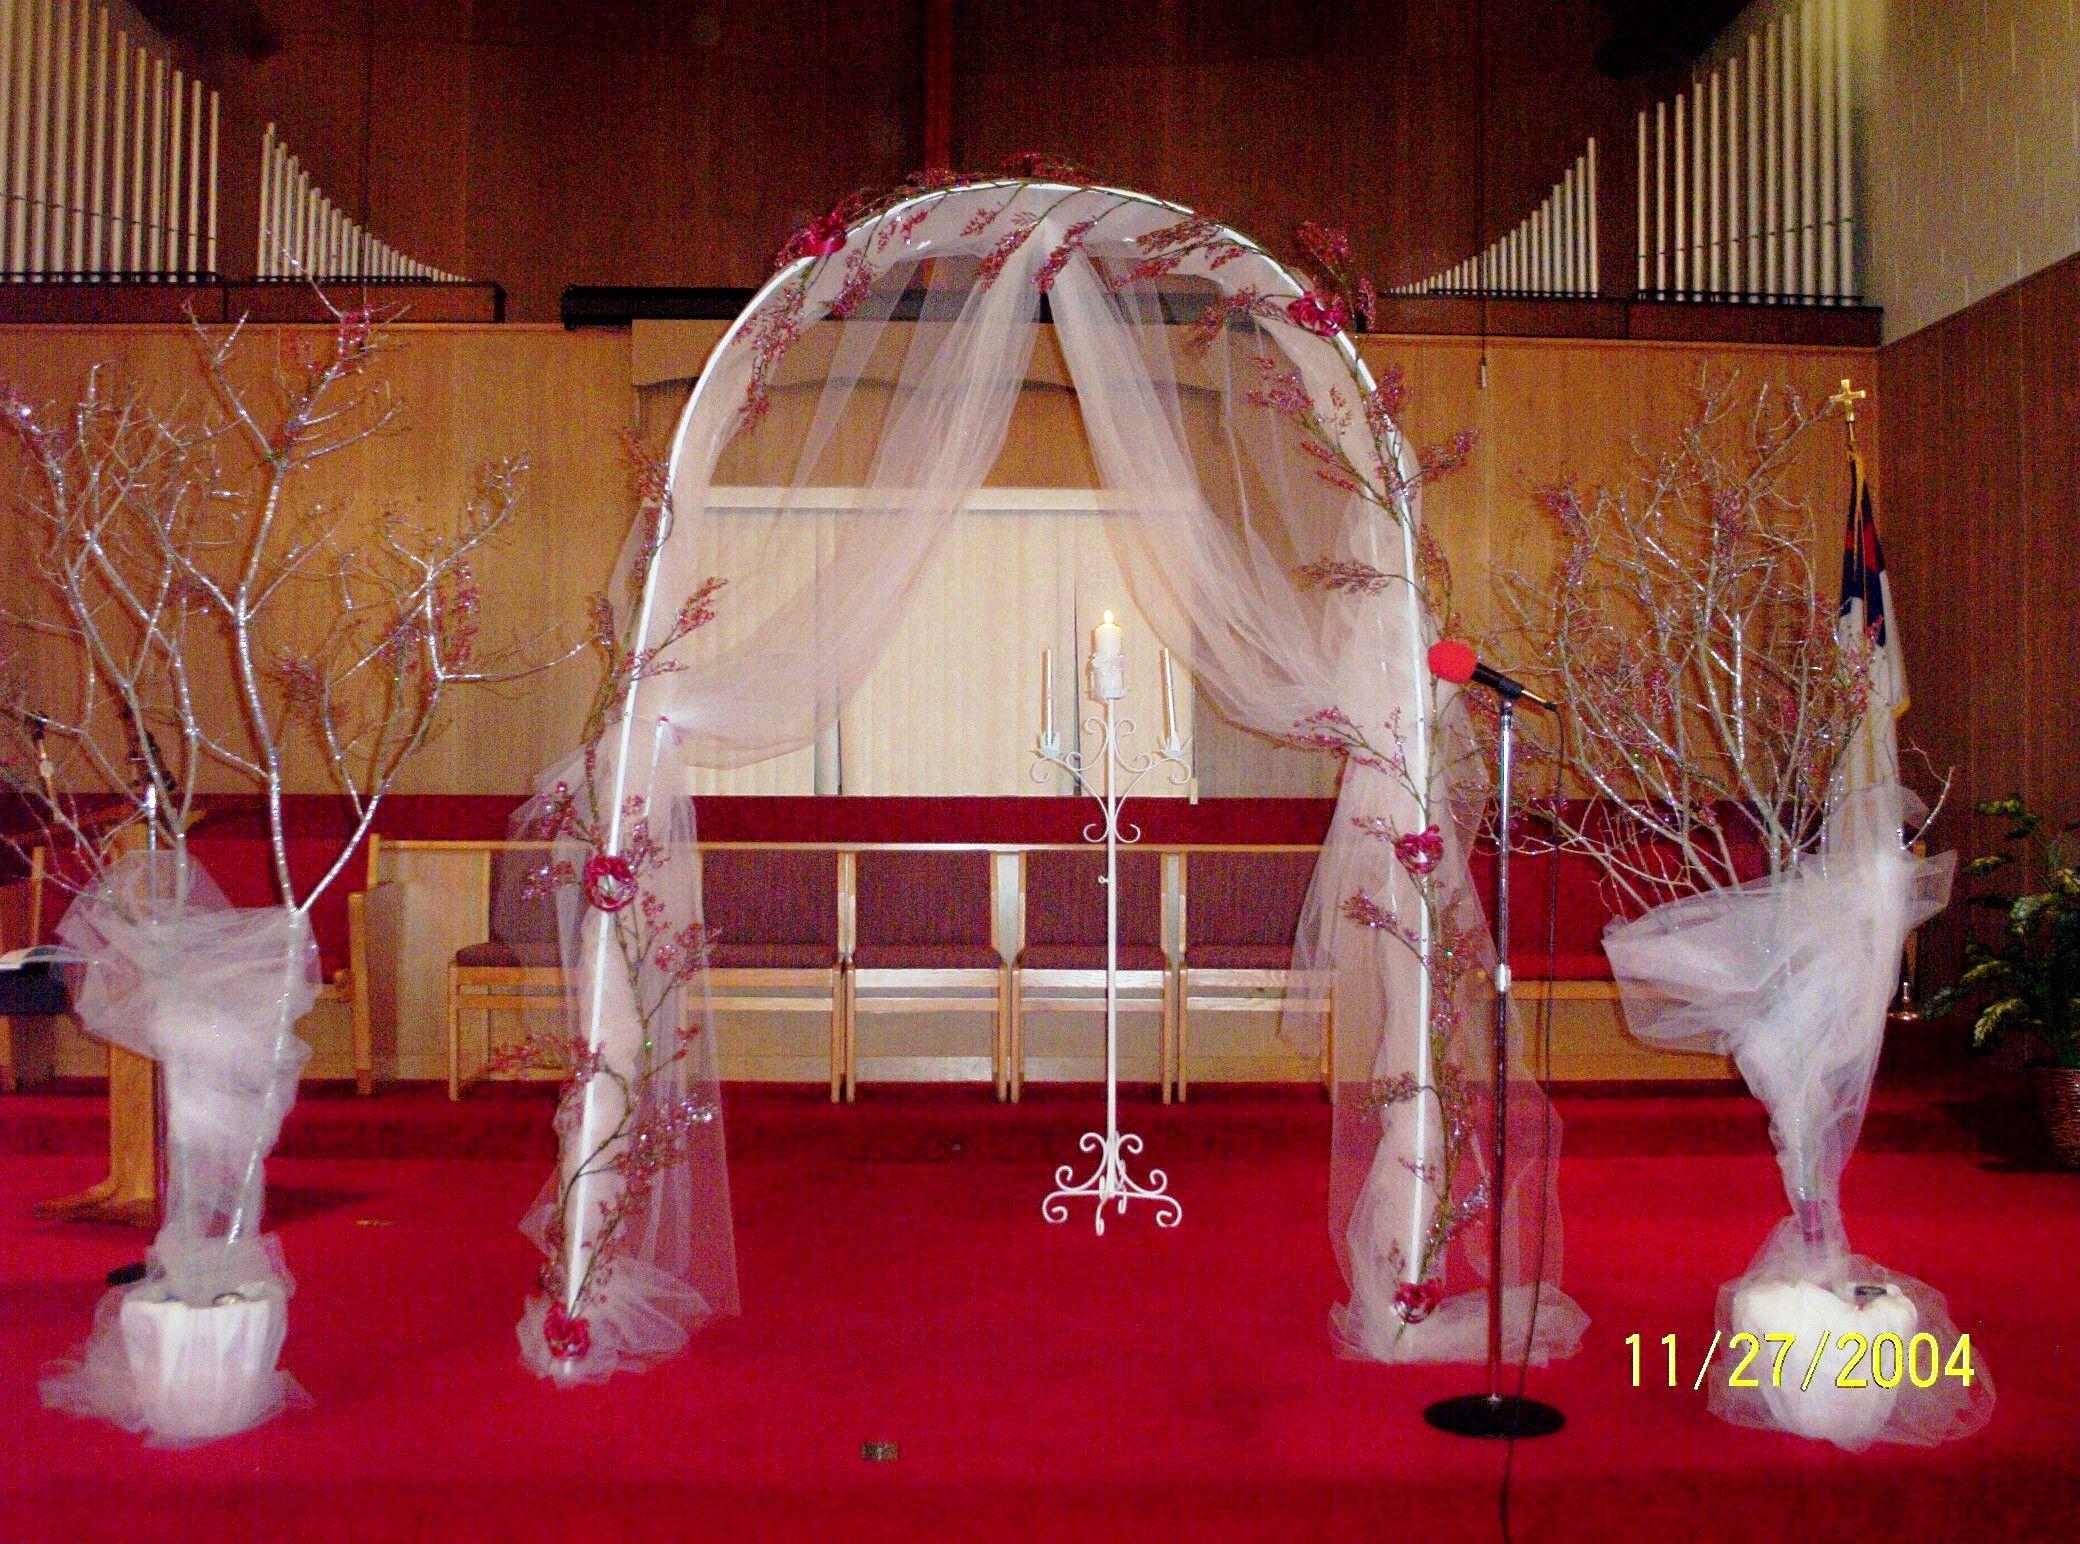 Simple Church Wedding Arrangements Elegant Decorations 2080x1544 In 1mb